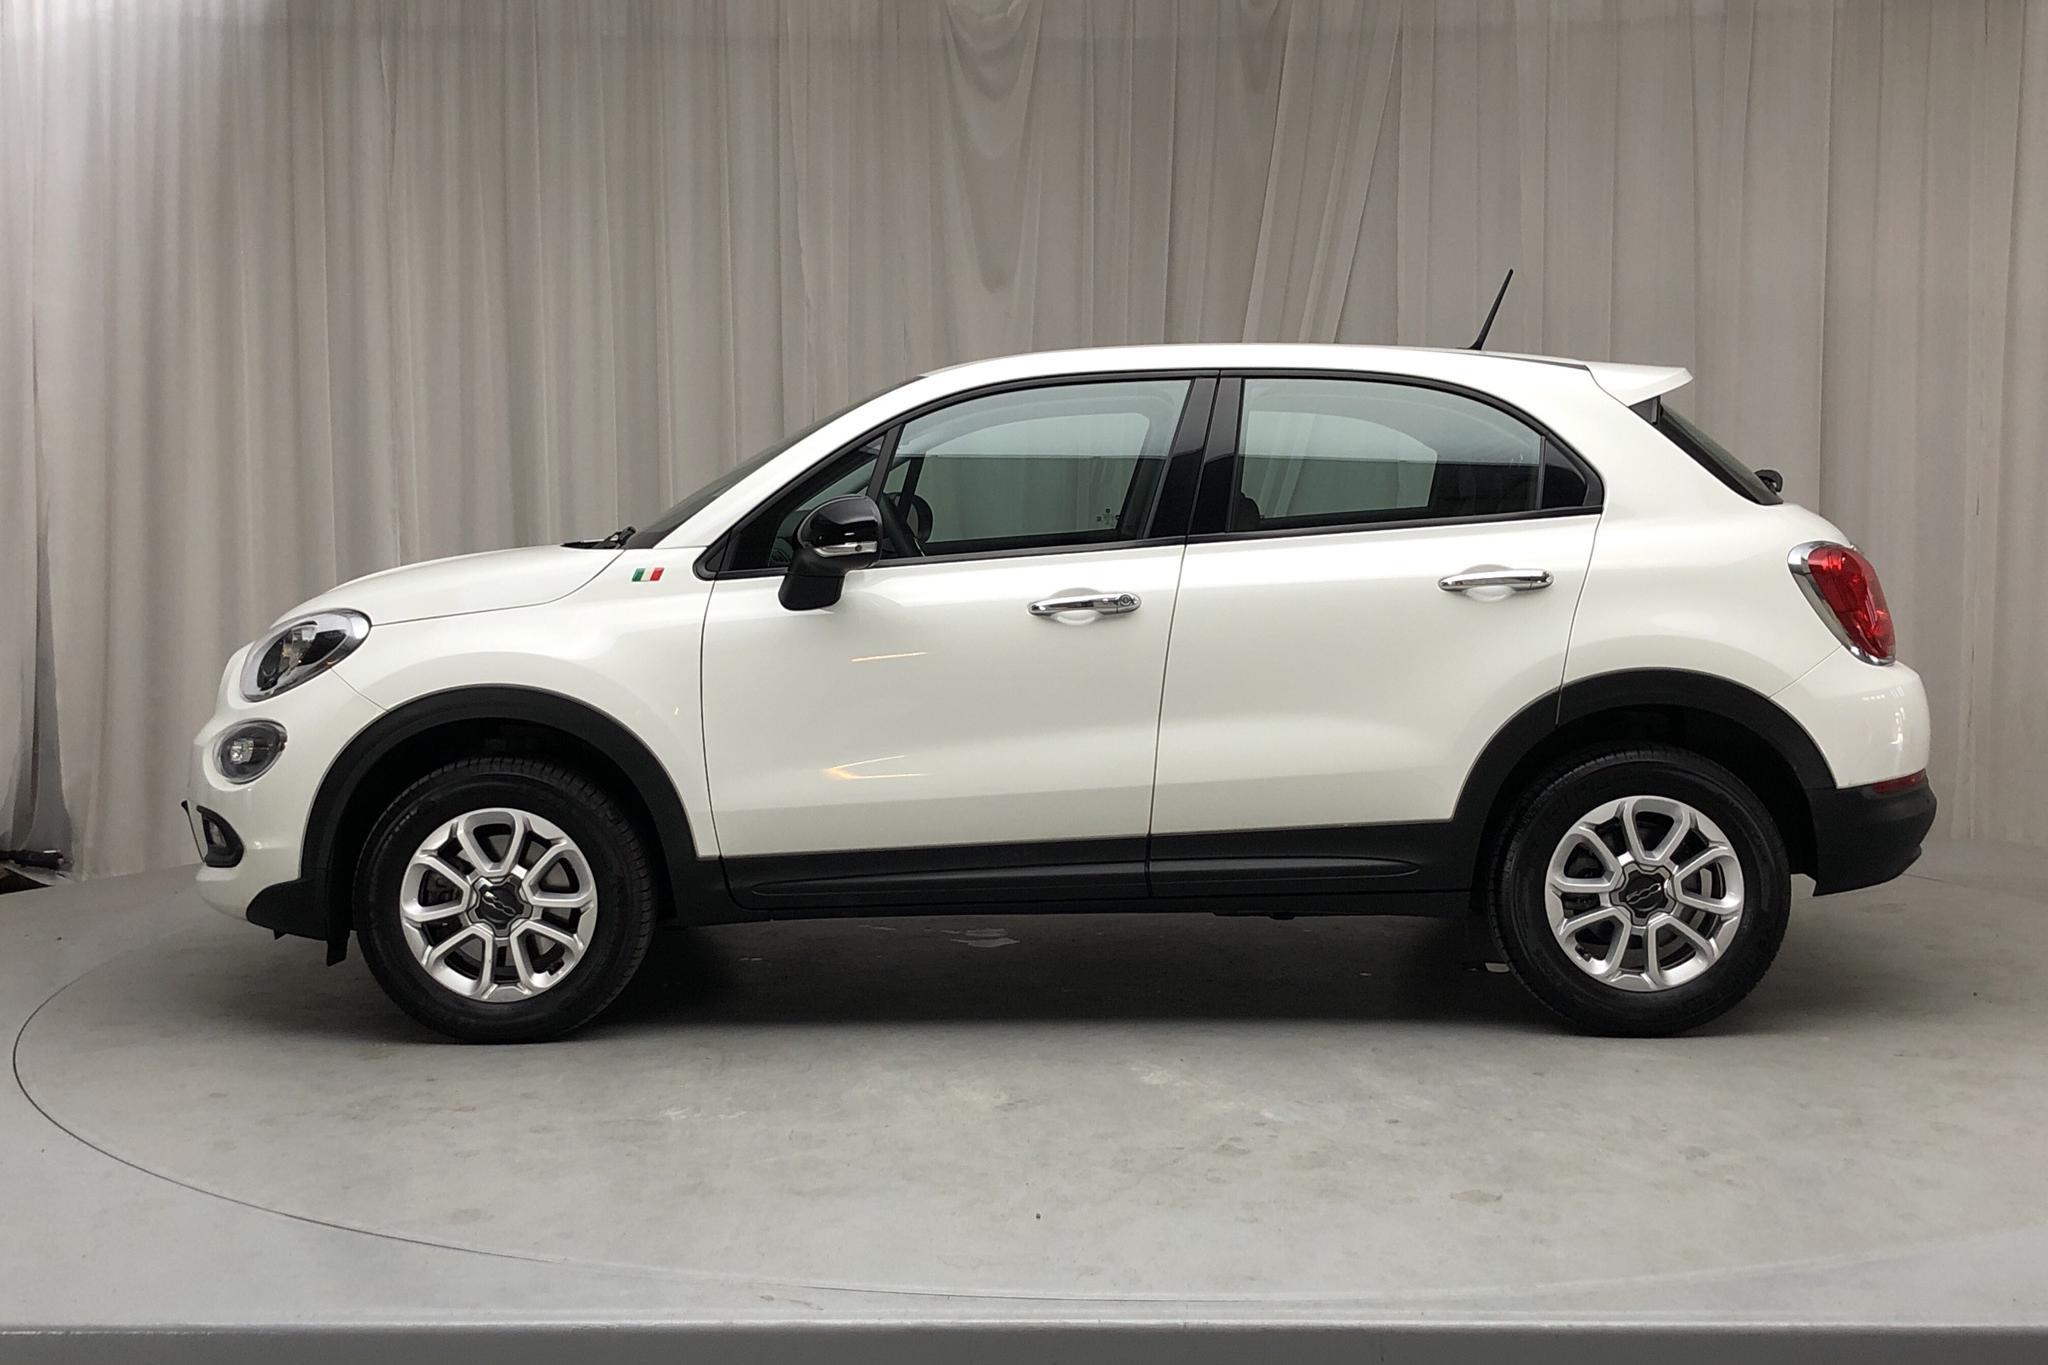 Fiat 500X 1.4 M-Air (140hk) - 20 670 km - Automatic - white - 2018